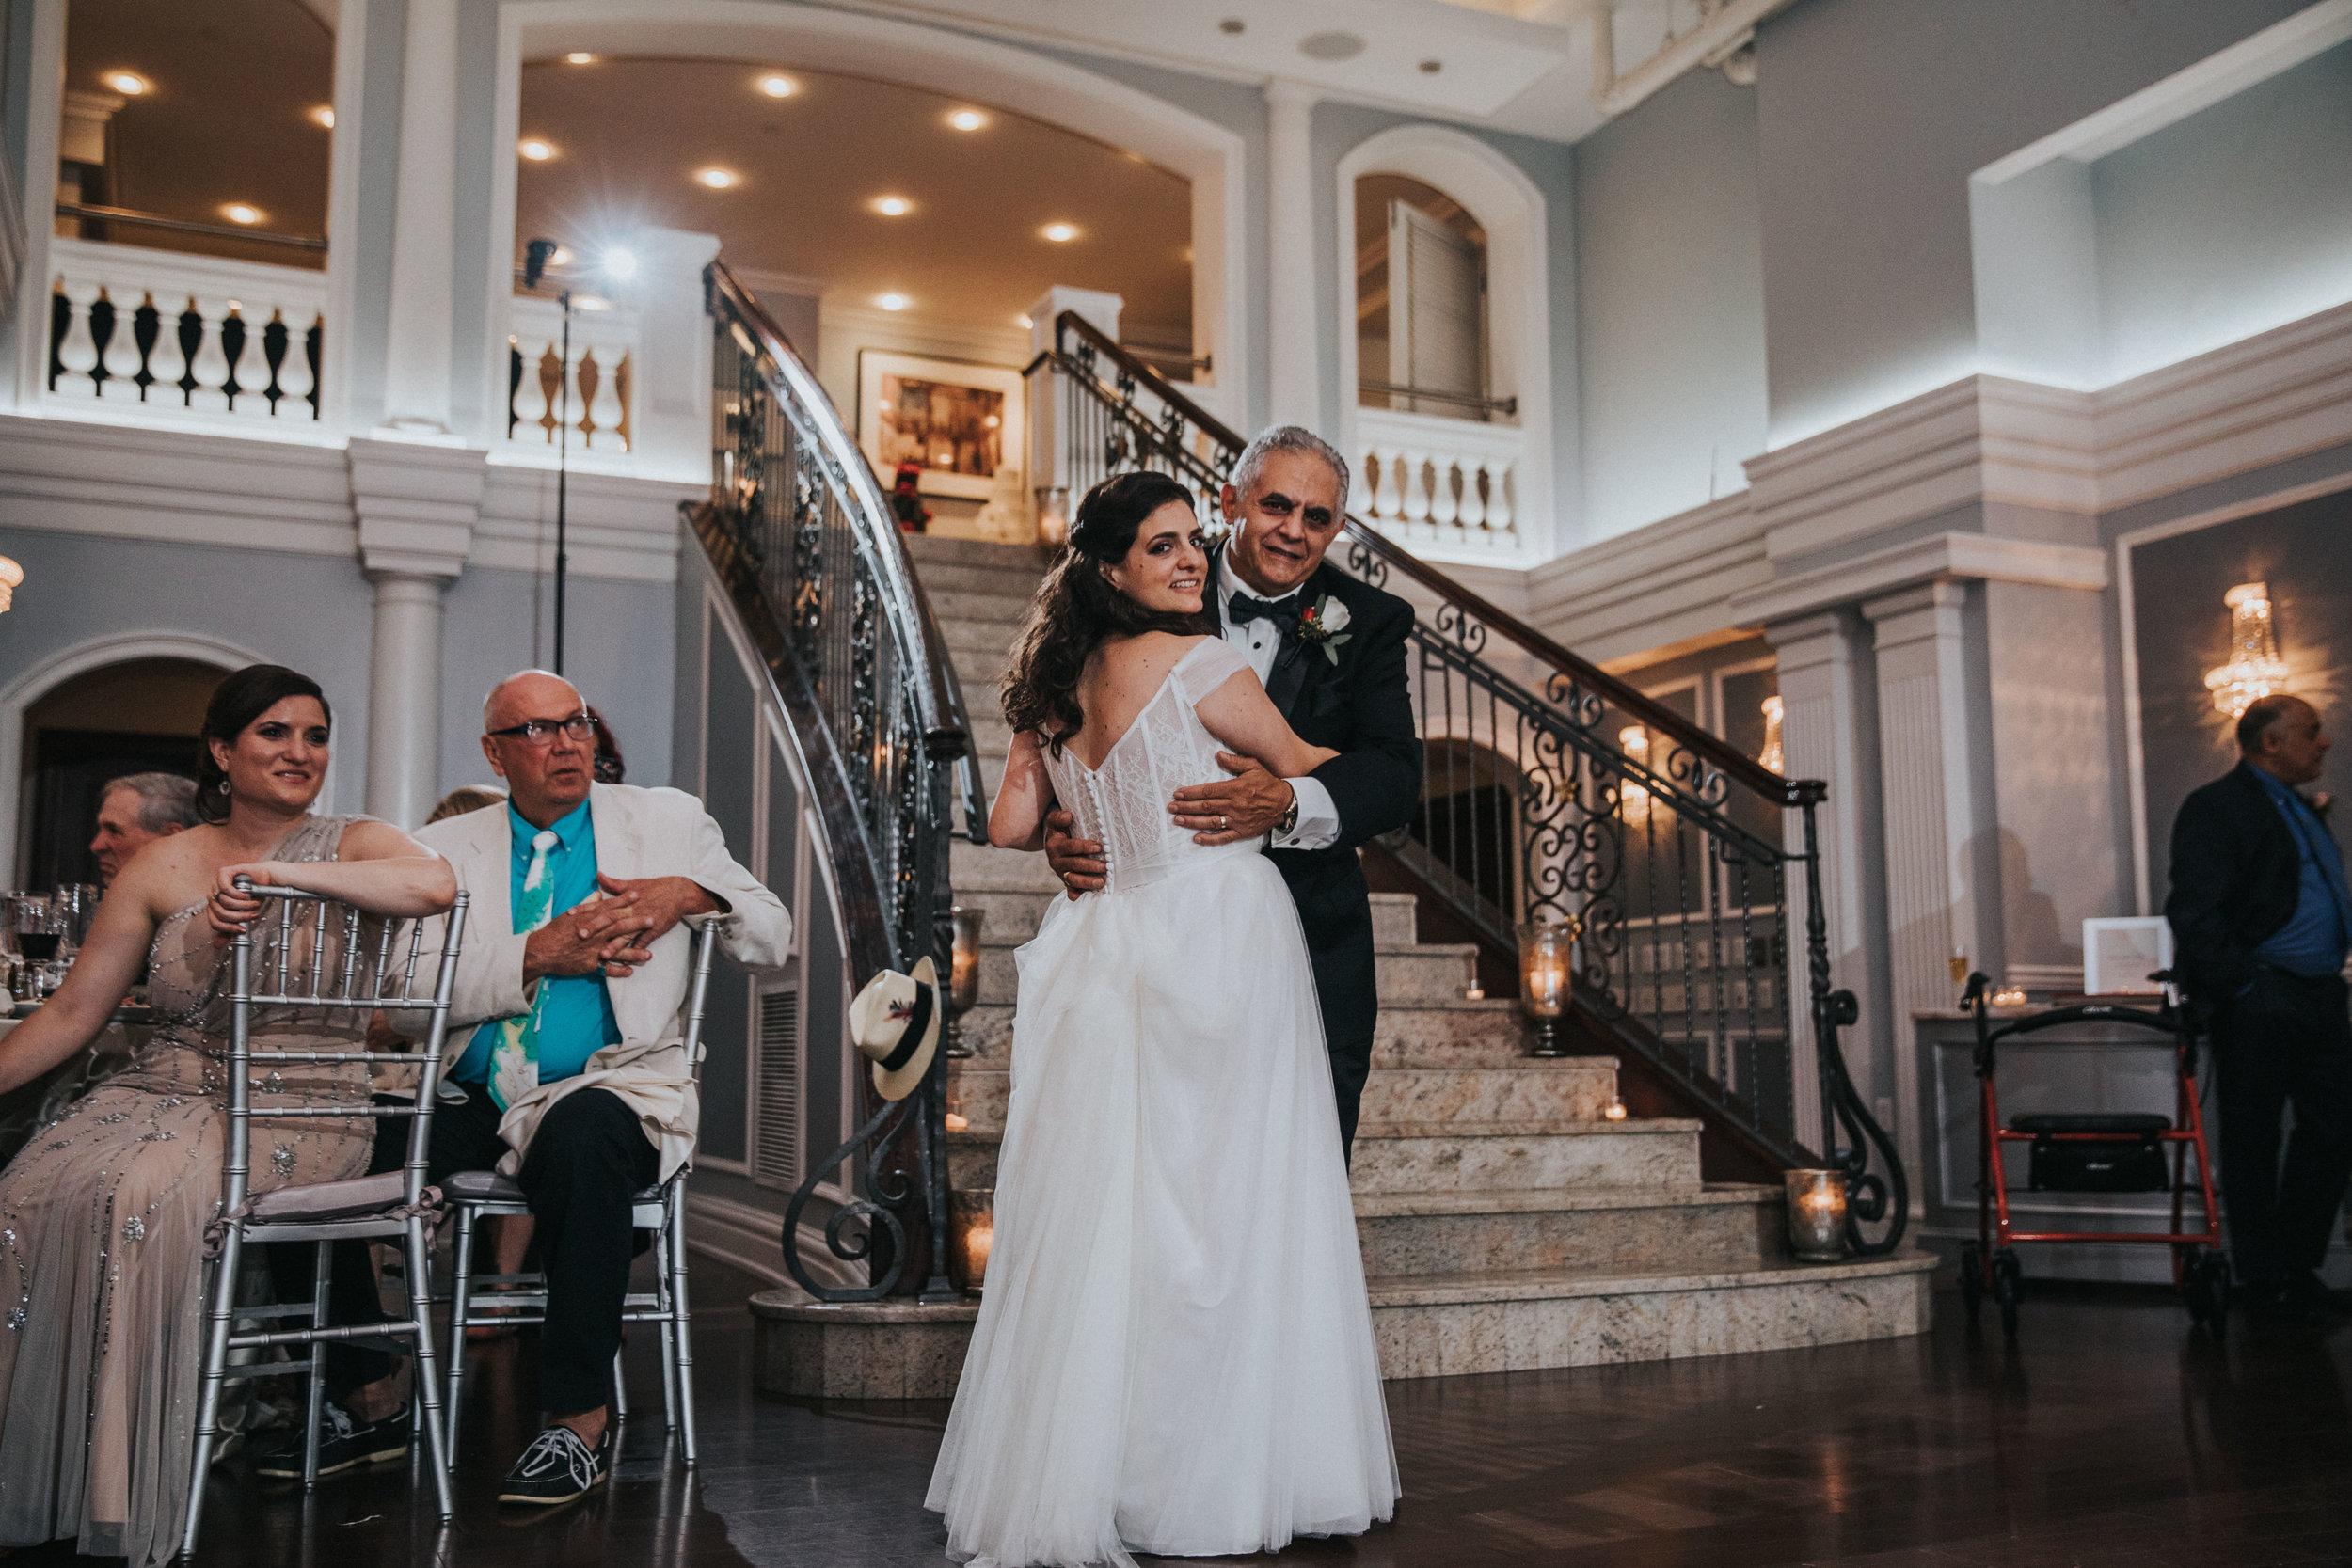 JennaLynnPhotography-NJWeddingPhotographer-Philadelphia-Wedding-ArtsBallroom-Reception-46.jpg